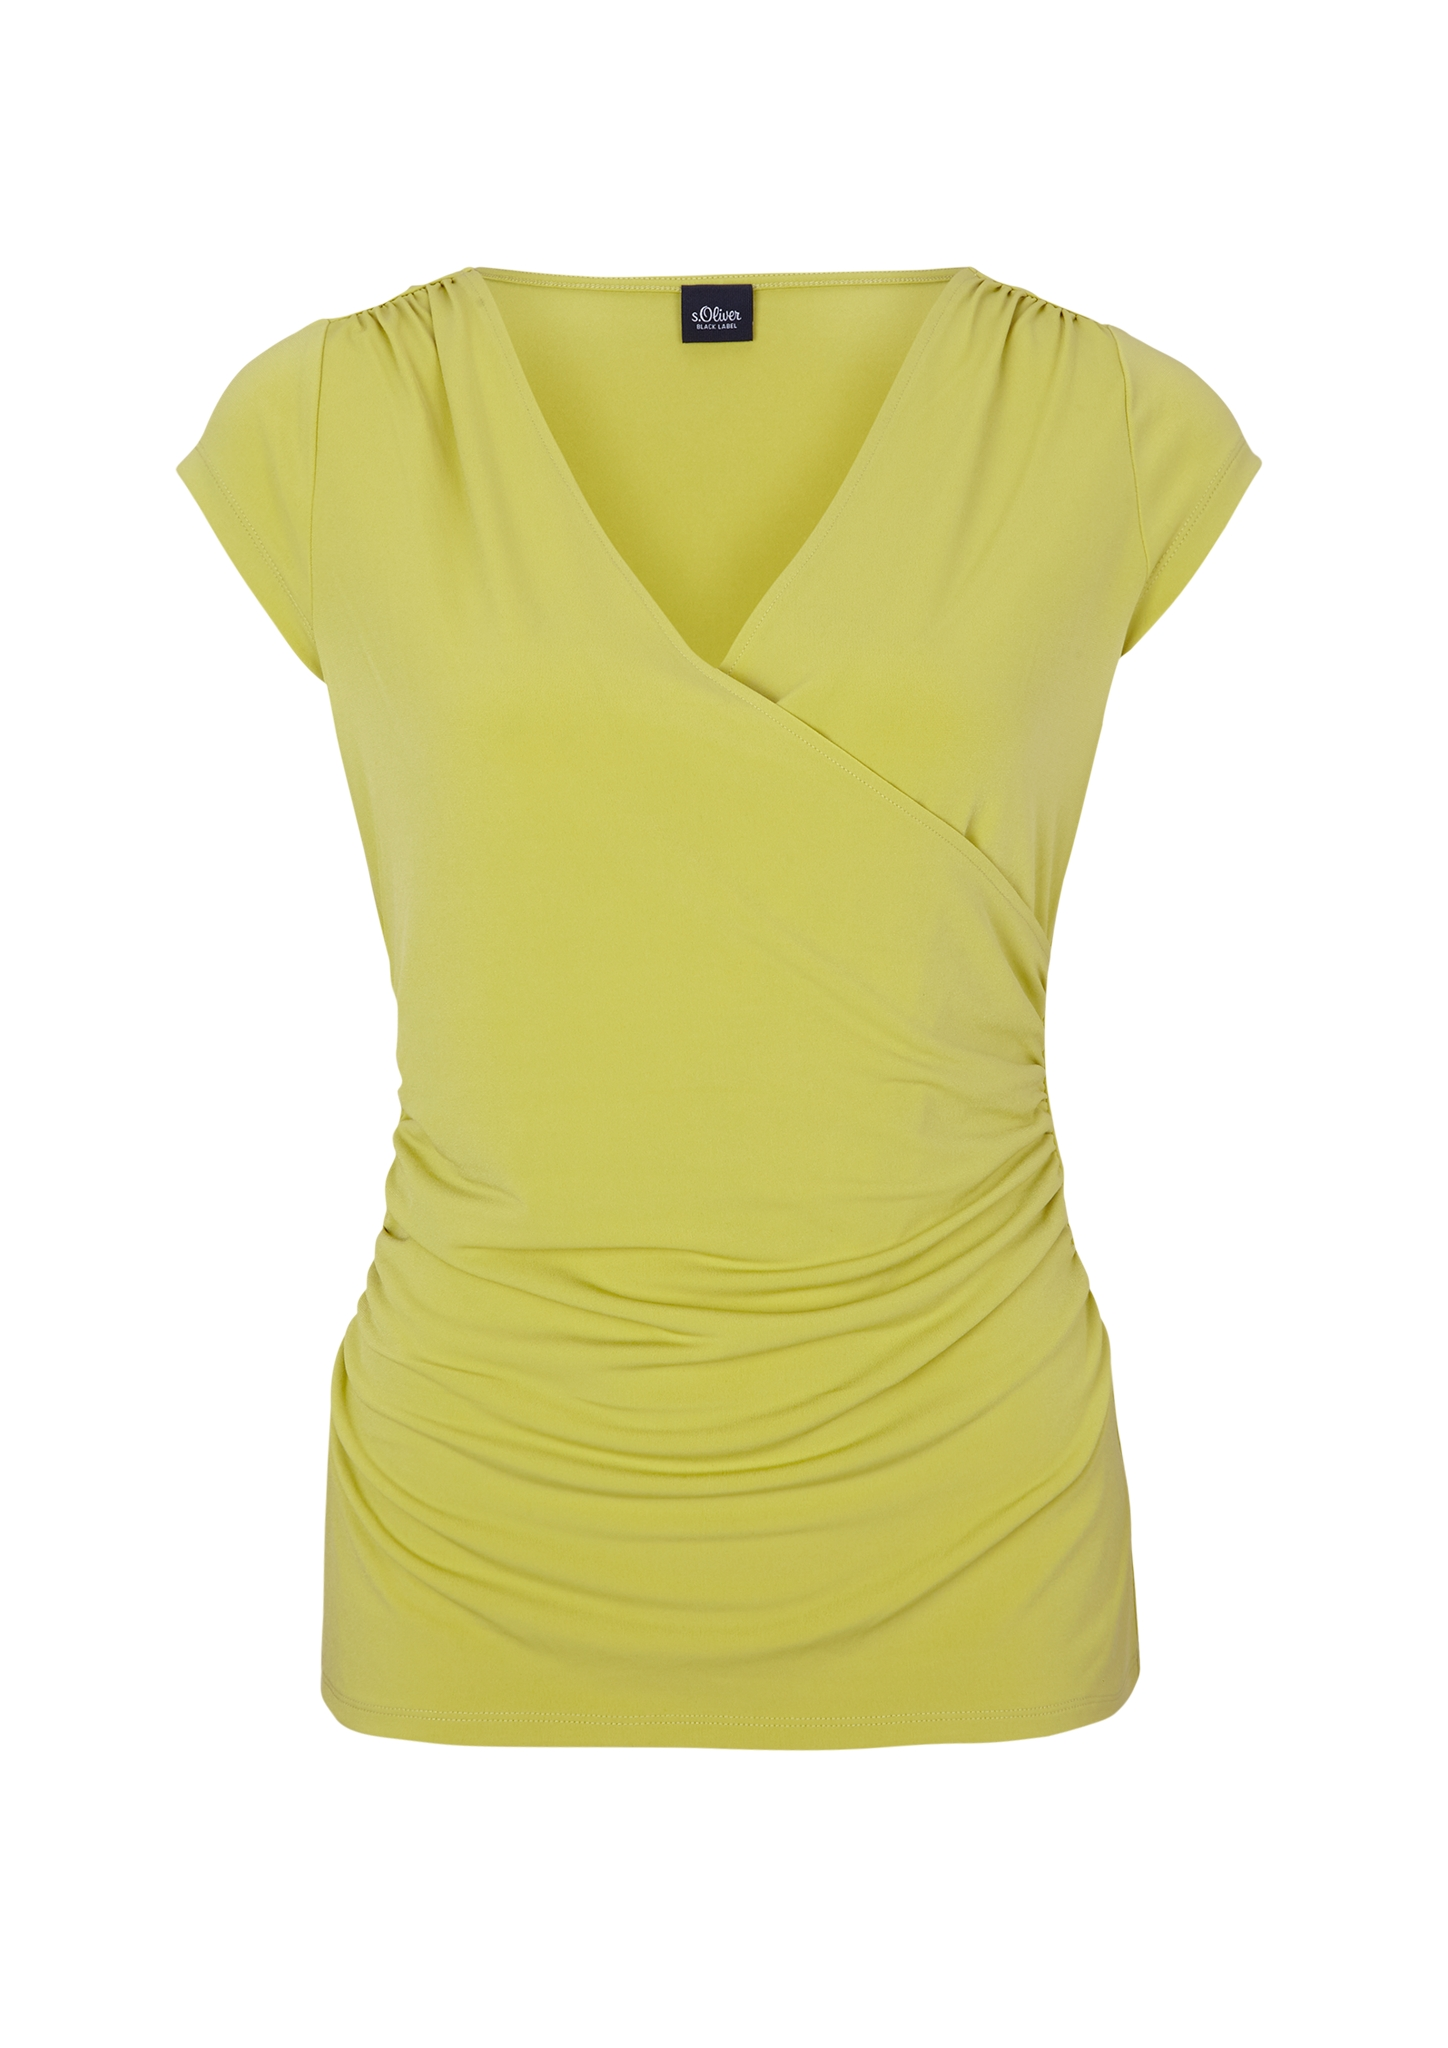 Wickelshirt | Bekleidung > Shirts > Wickelshirts | Grün | 95% polyester -  5% elasthan | s.Oliver BLACK LABEL